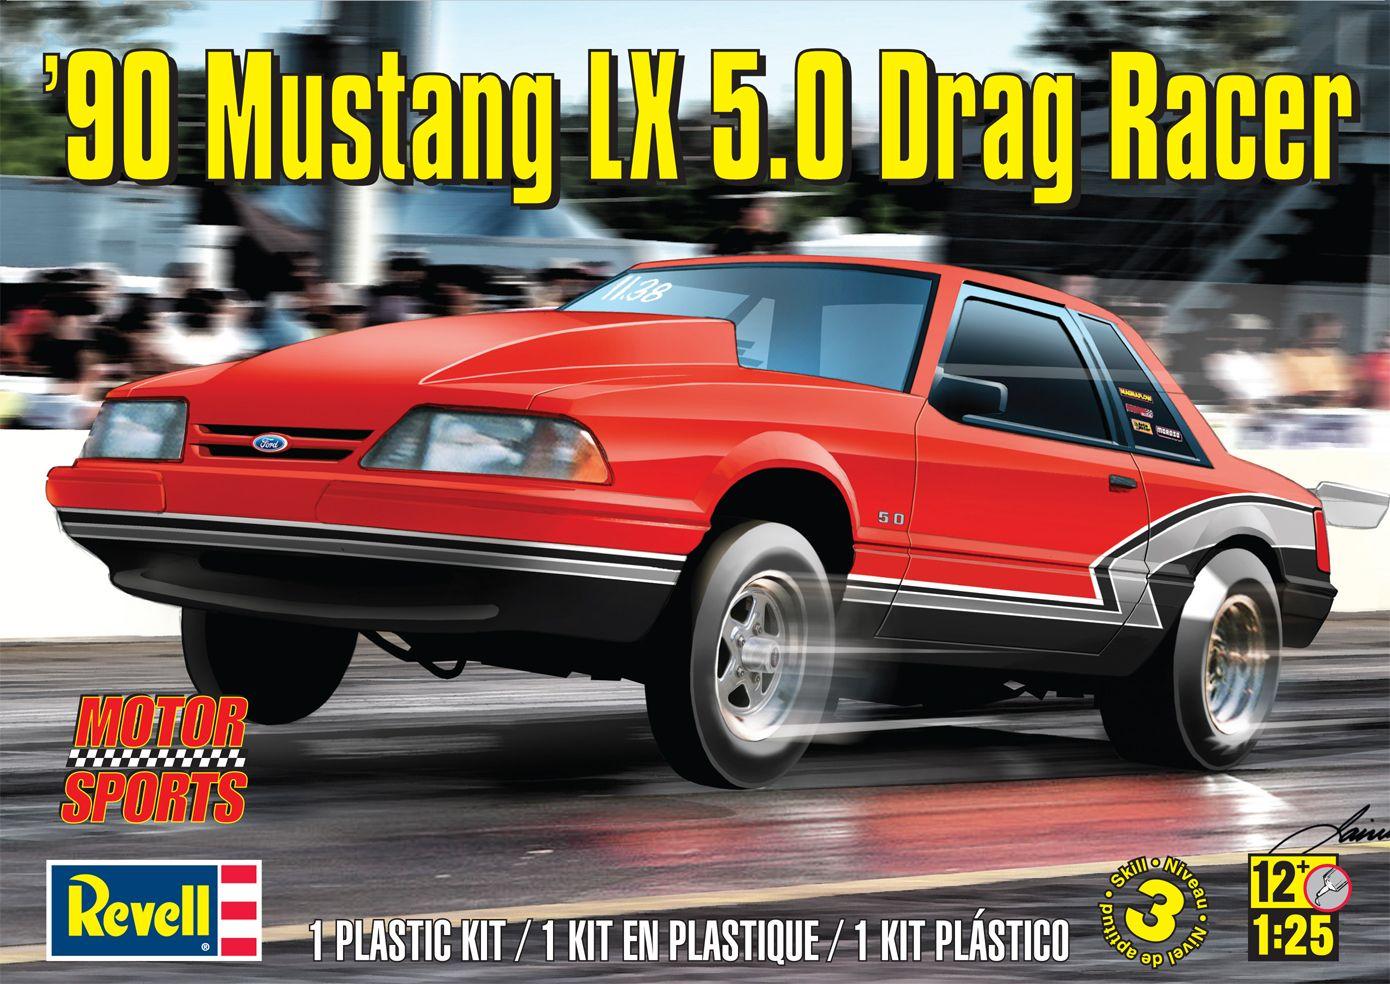 90 mustang lx 5 0 drag racer plastic model kit 1 25 scale from